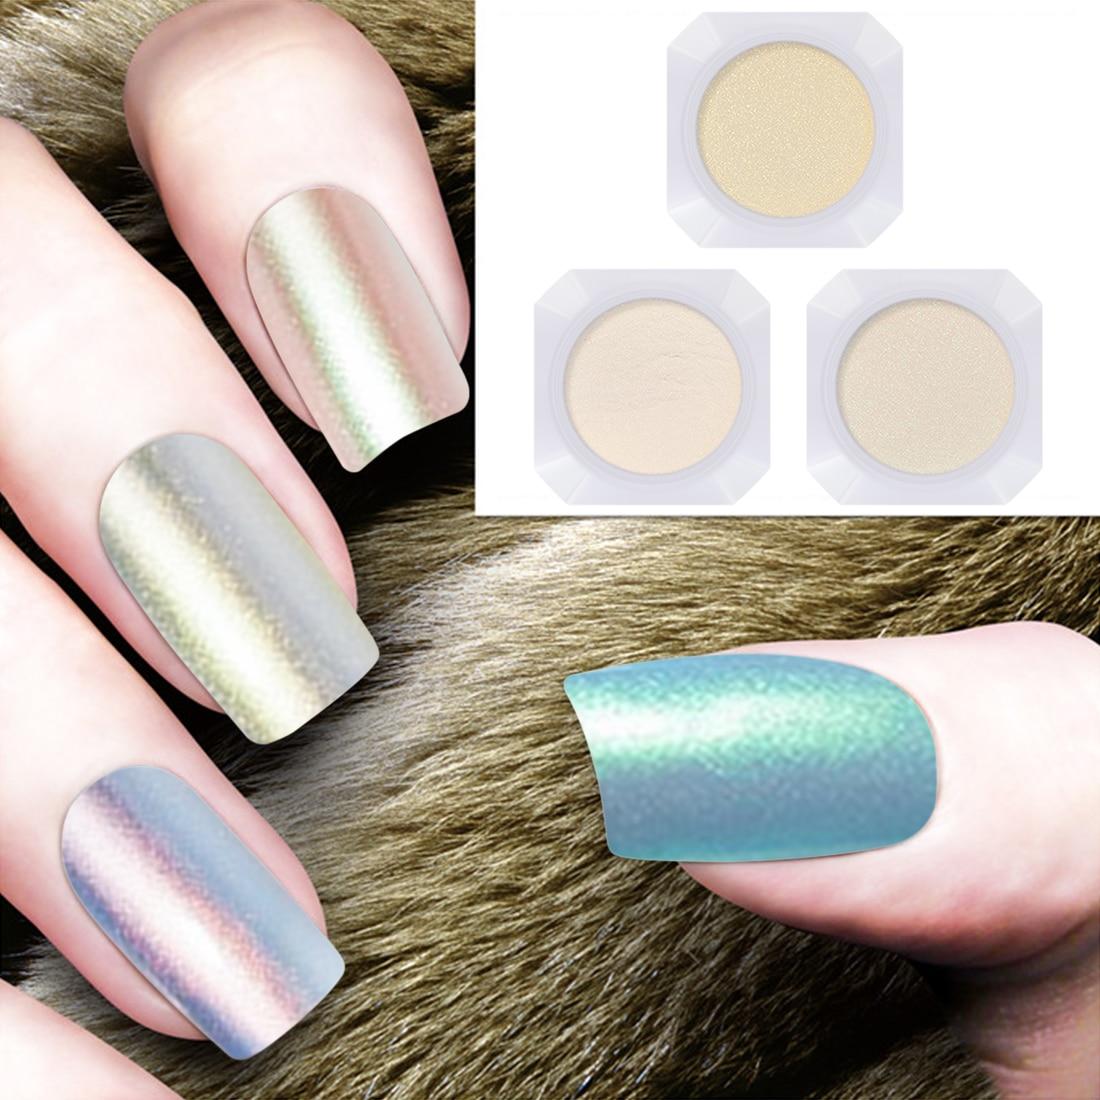 3 Colors Mirror Powder Tips Art Shining Nail Glitter Pearl Shimmer Nail Dust Powder 2g/Box Mermaid Manicure Nail Art Dip Glitter